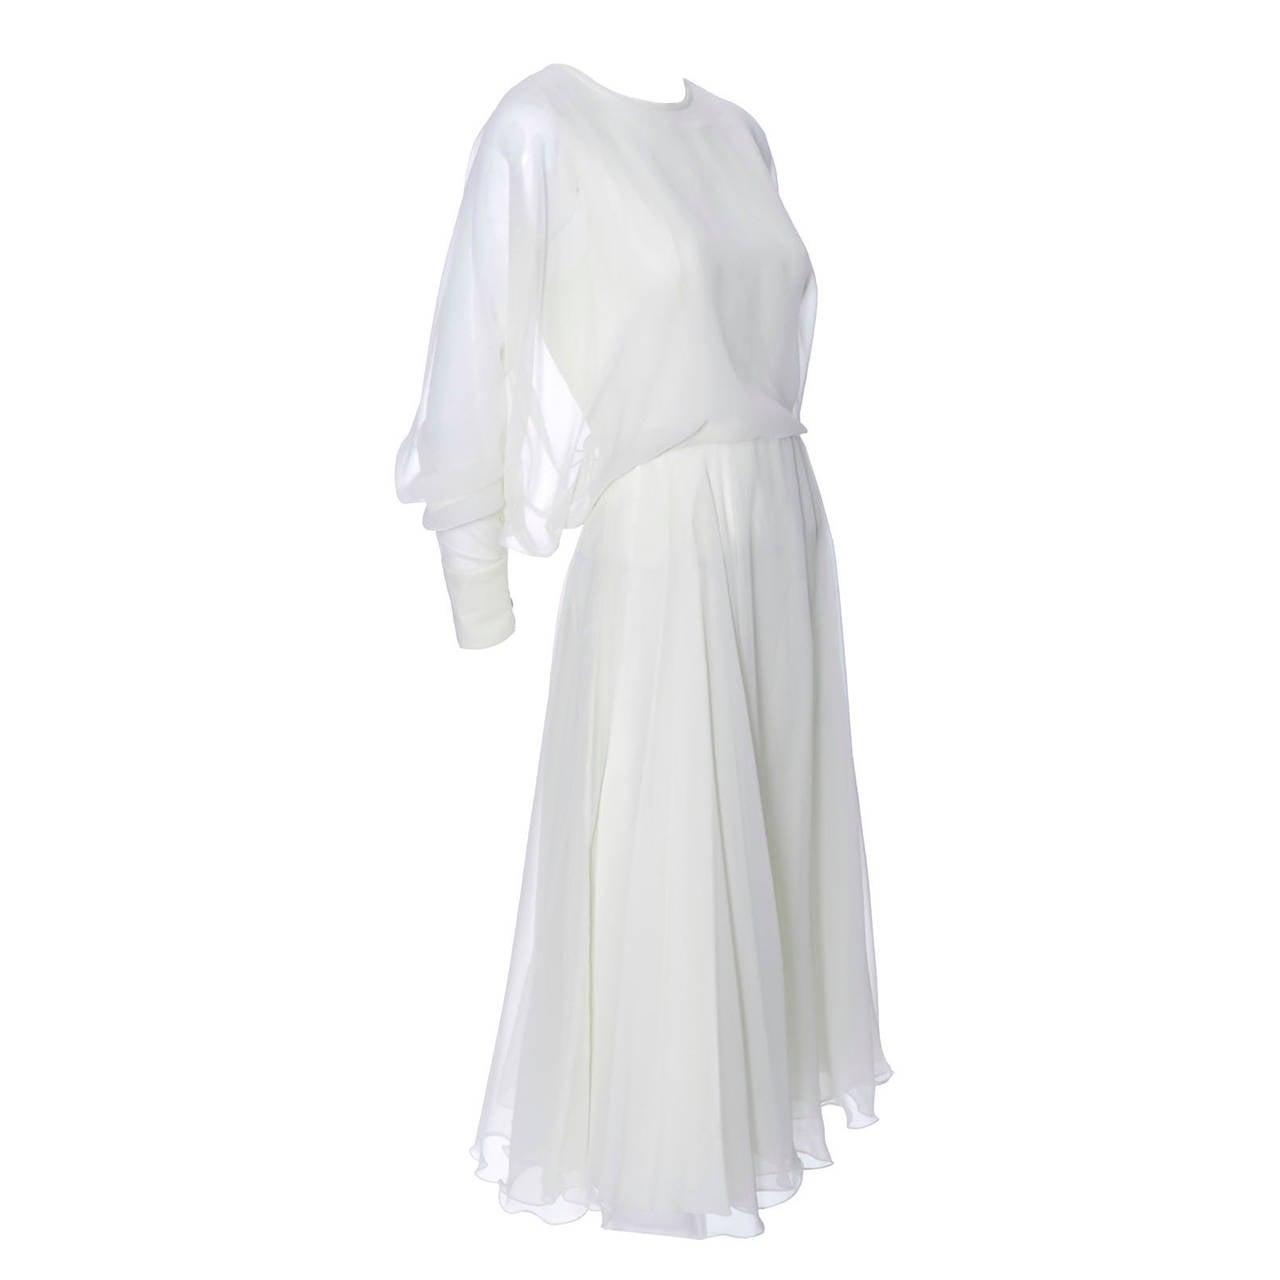 1970s Vintage Jean Varon John Bates Chiffon Designer Dress Batwing Sleeves For Sale